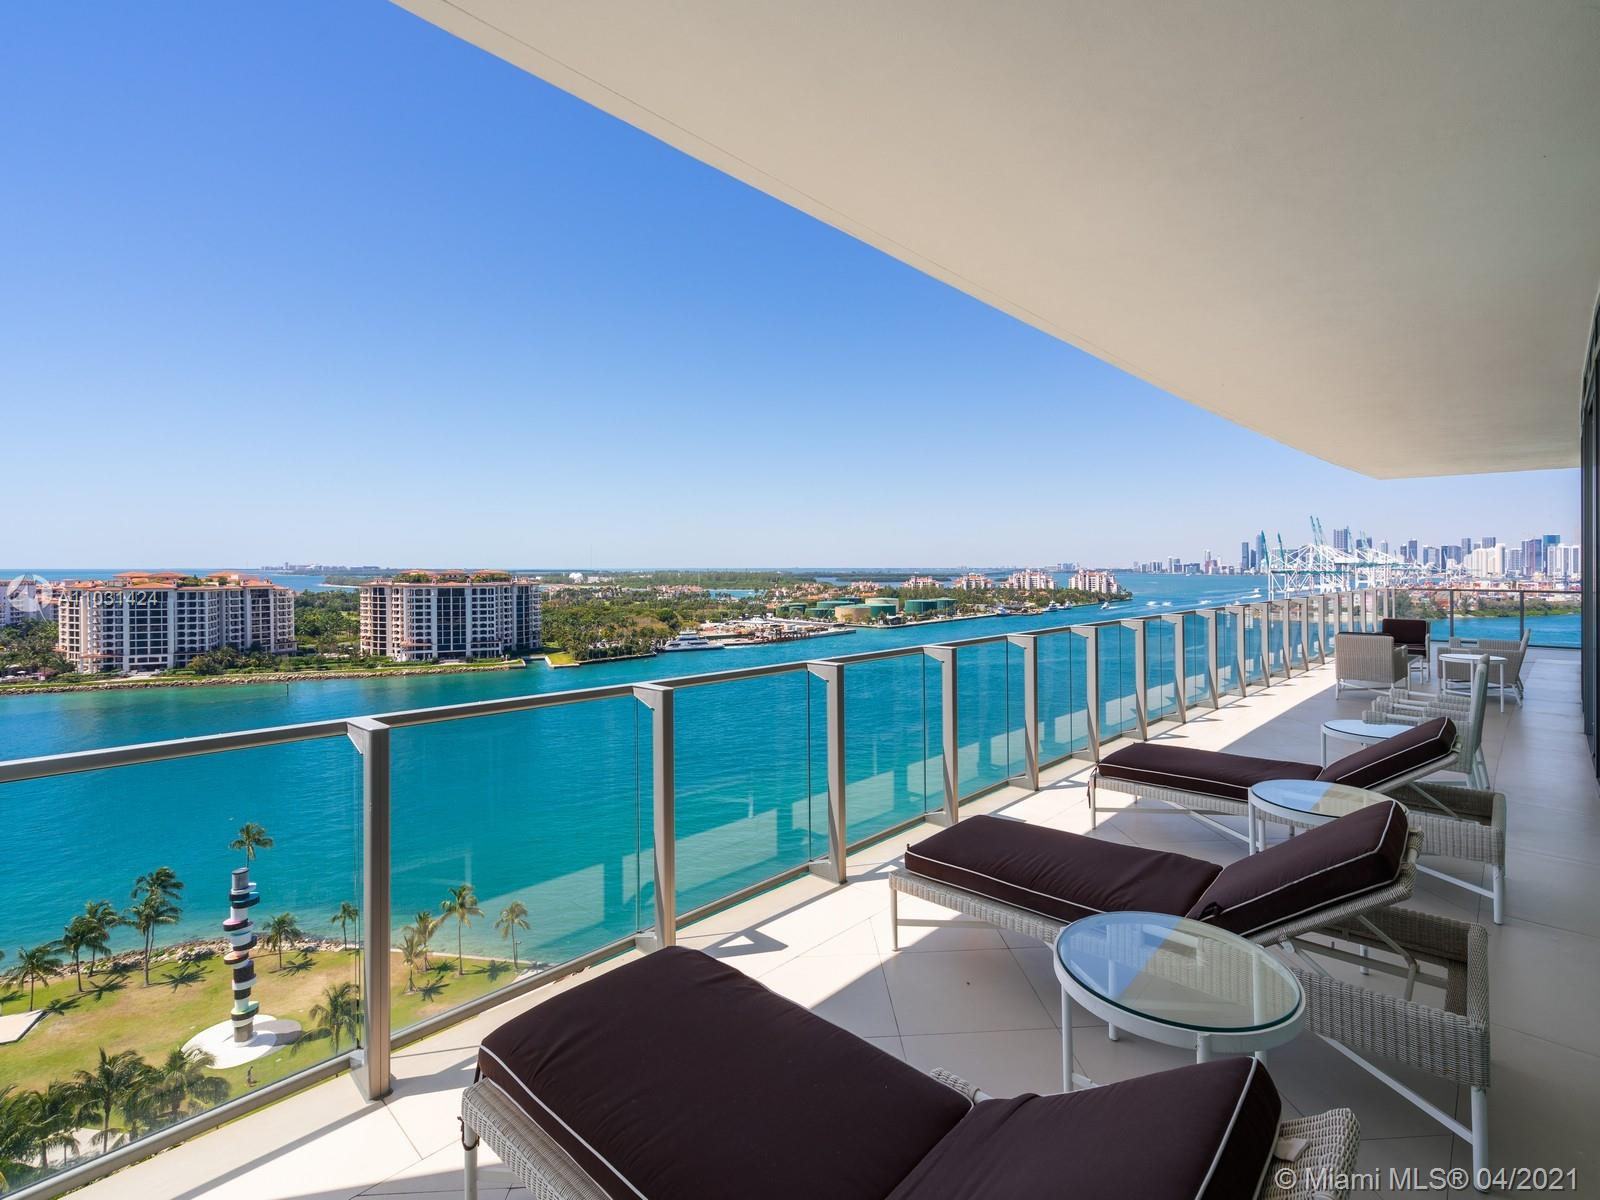 Apogee #1504 - 800 S POINTE DR #1504, Miami Beach, FL 33139